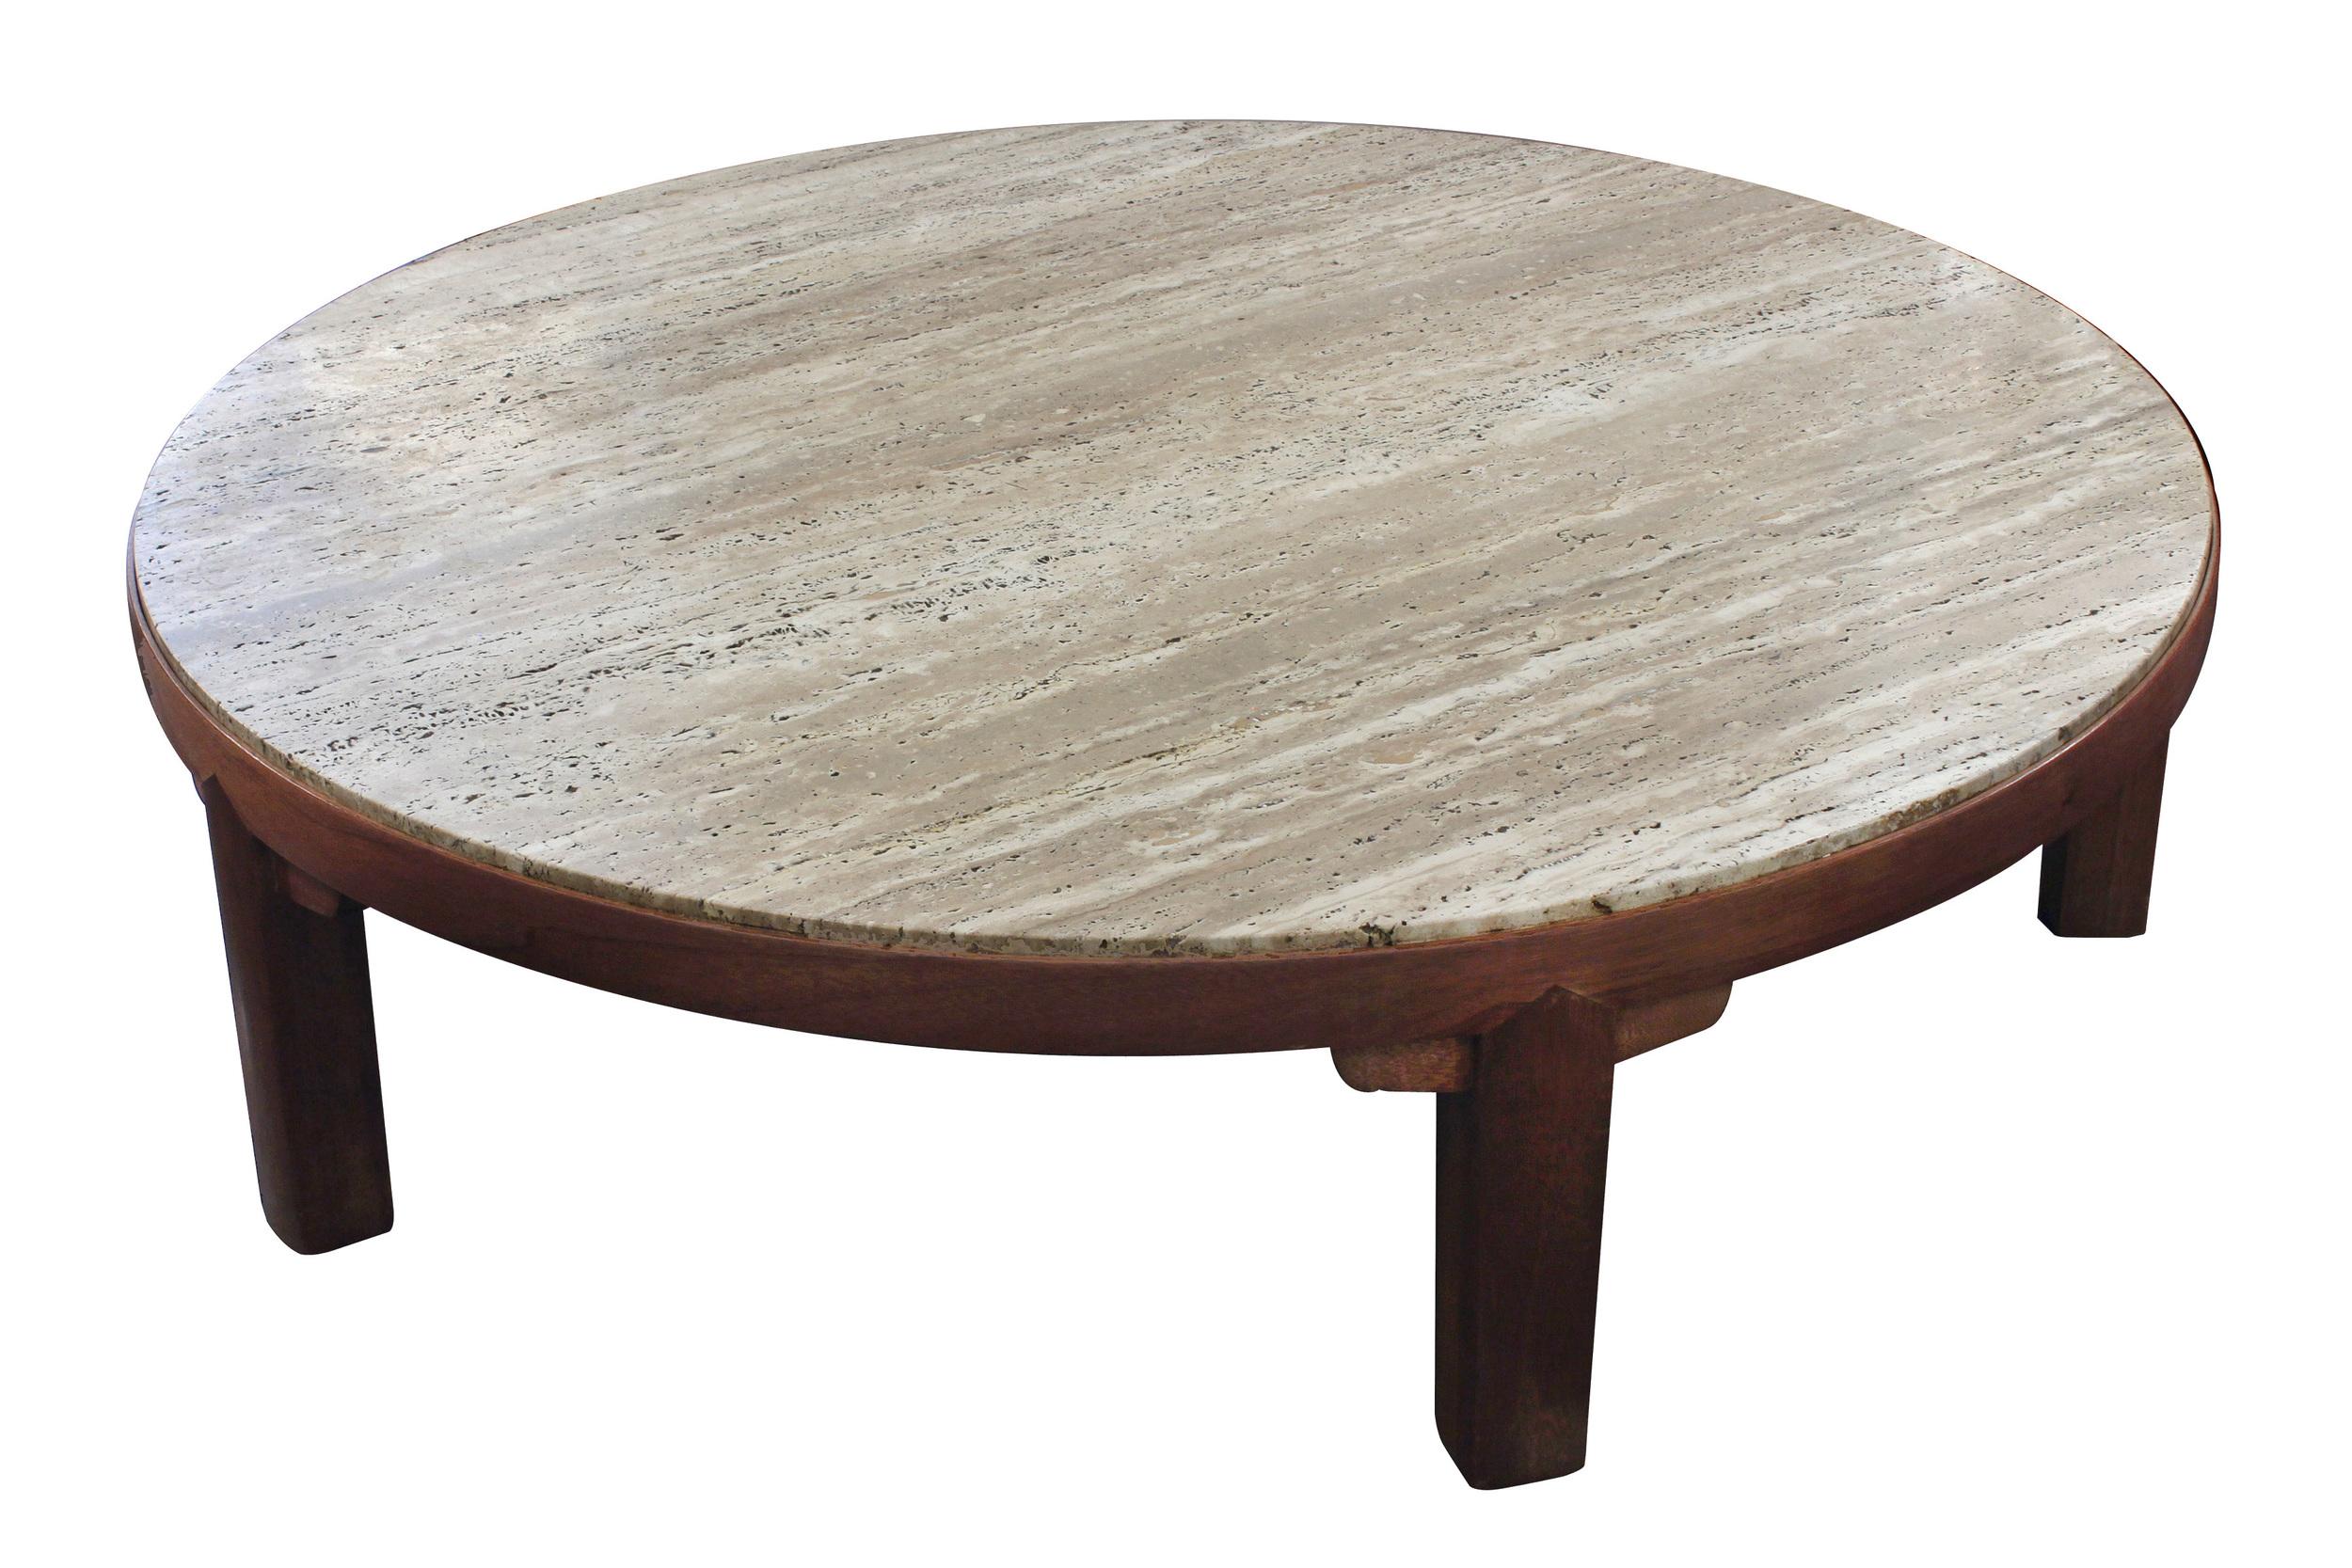 Dunbar 120 round travertine+mahg coffeetable 26 hires.jpg